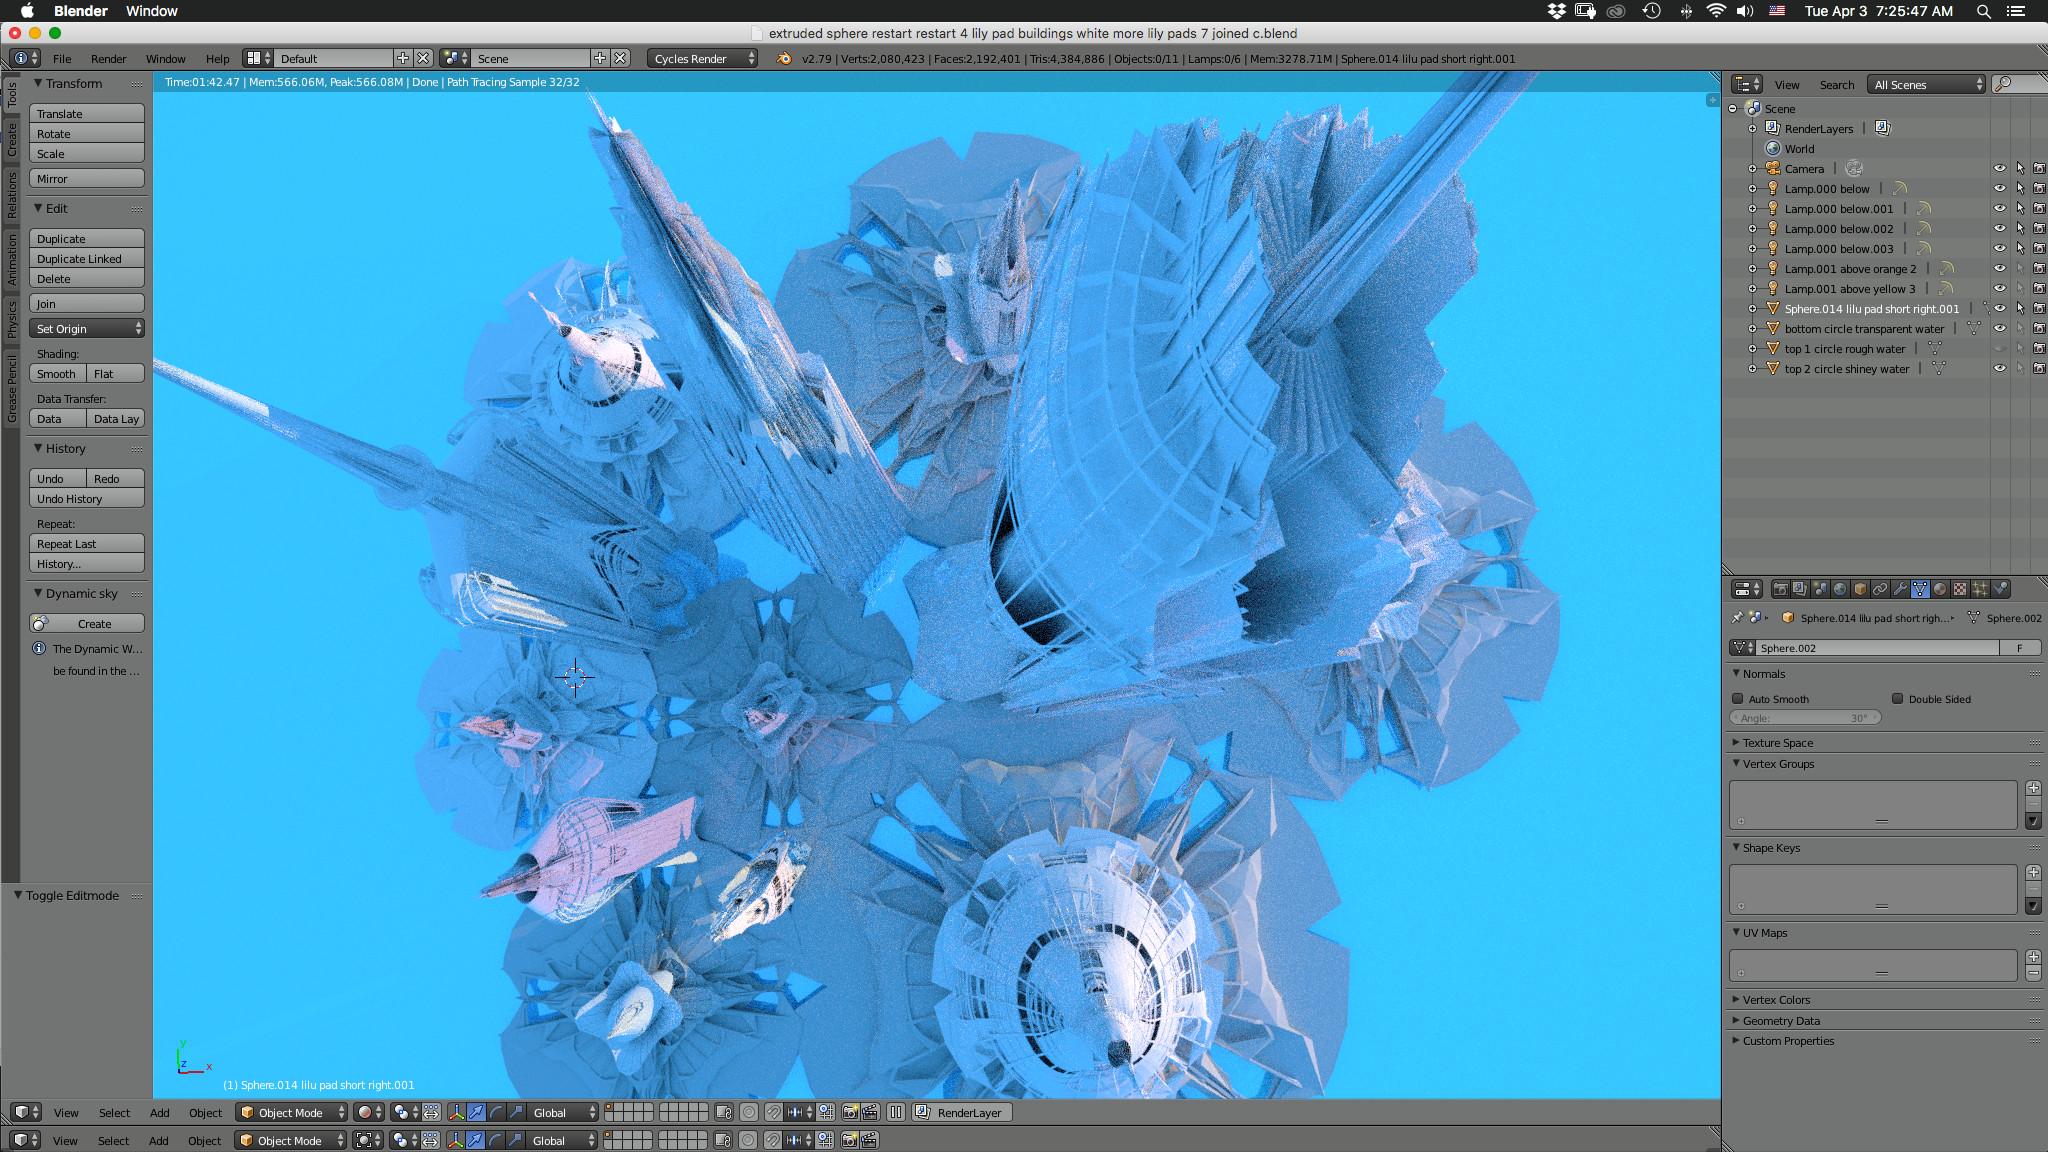 Bird's Eye! So much fun running the camera around through 3d shapes, like a giddy preschool kid!